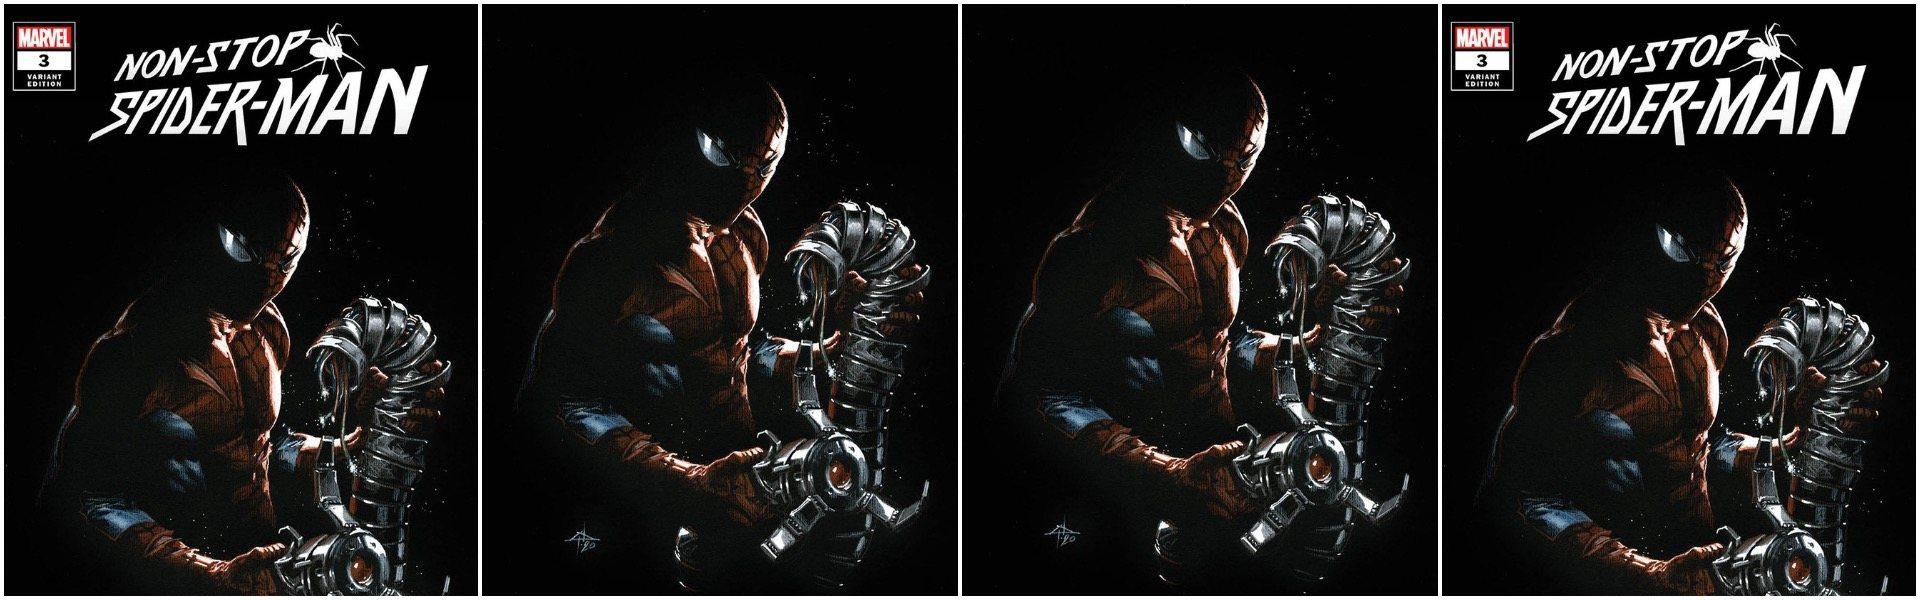 Non-Stop Spider-Man #3 Gabriele Dell'Otto Variants